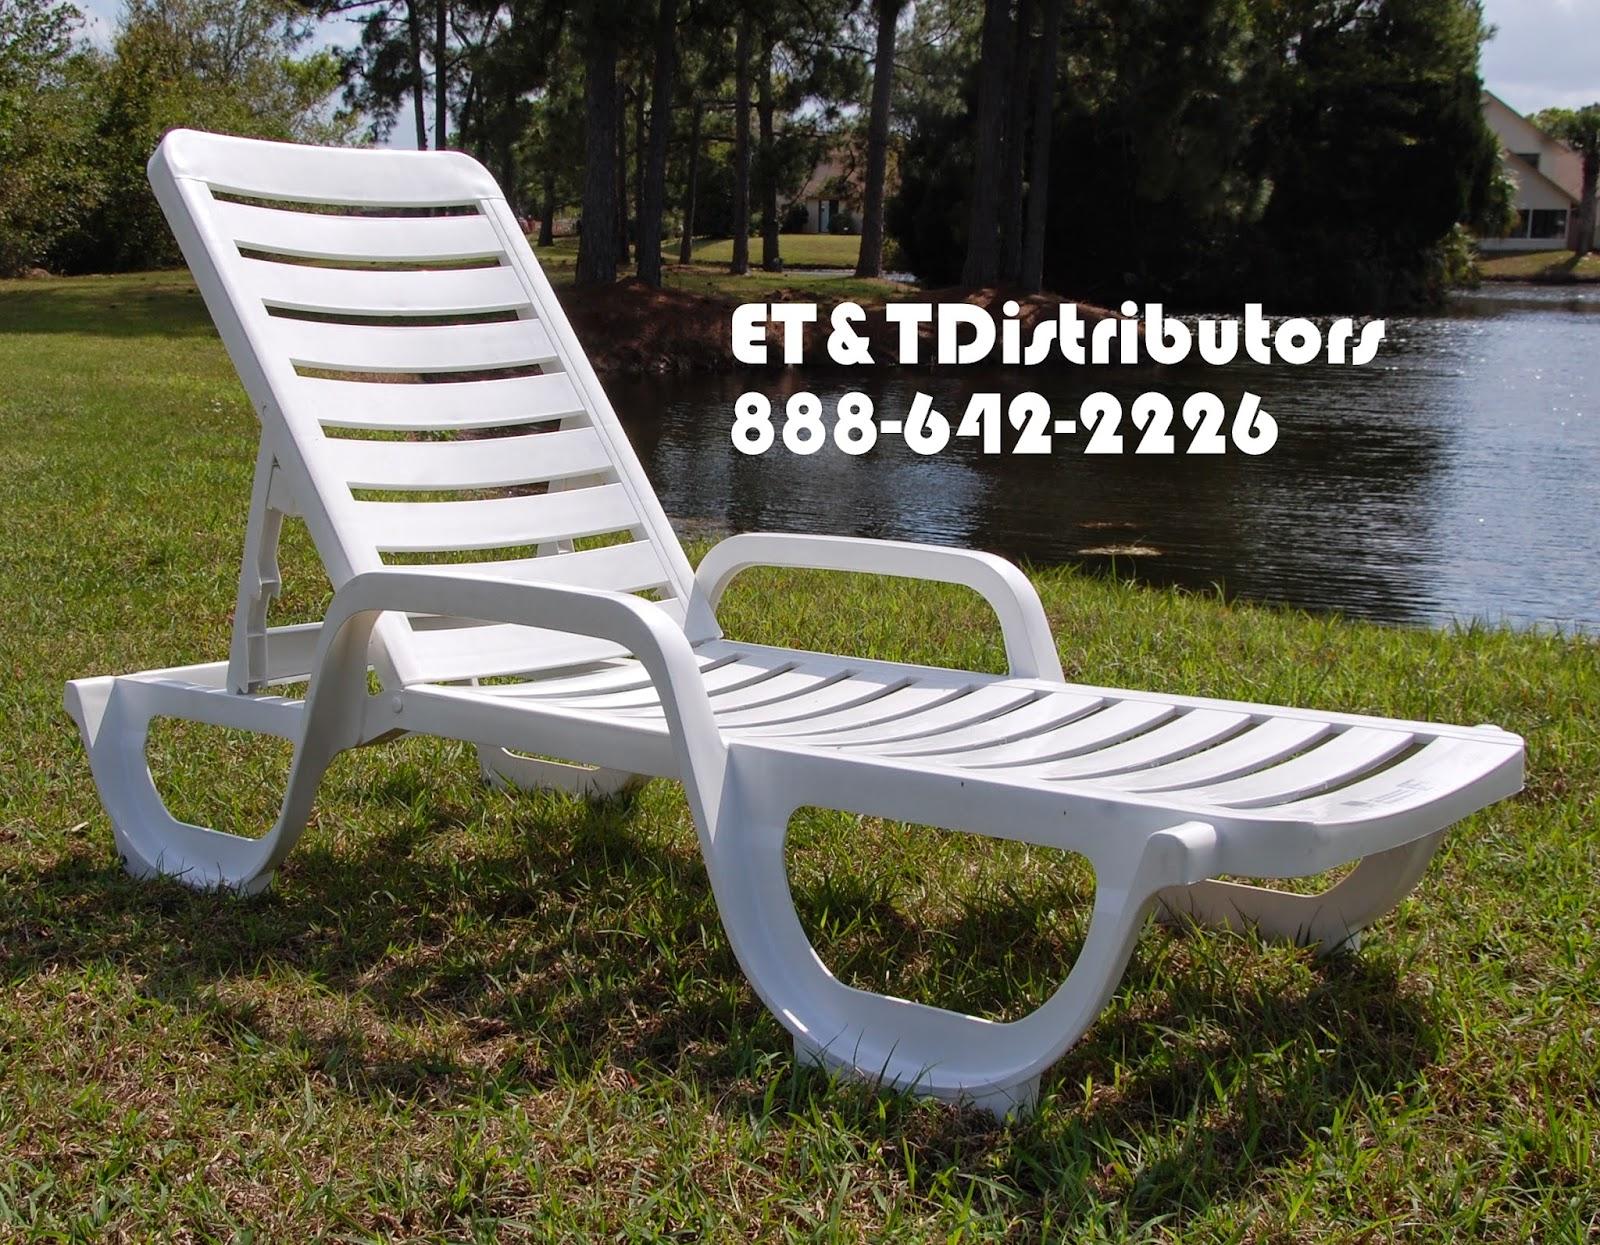 ET&T Distributors